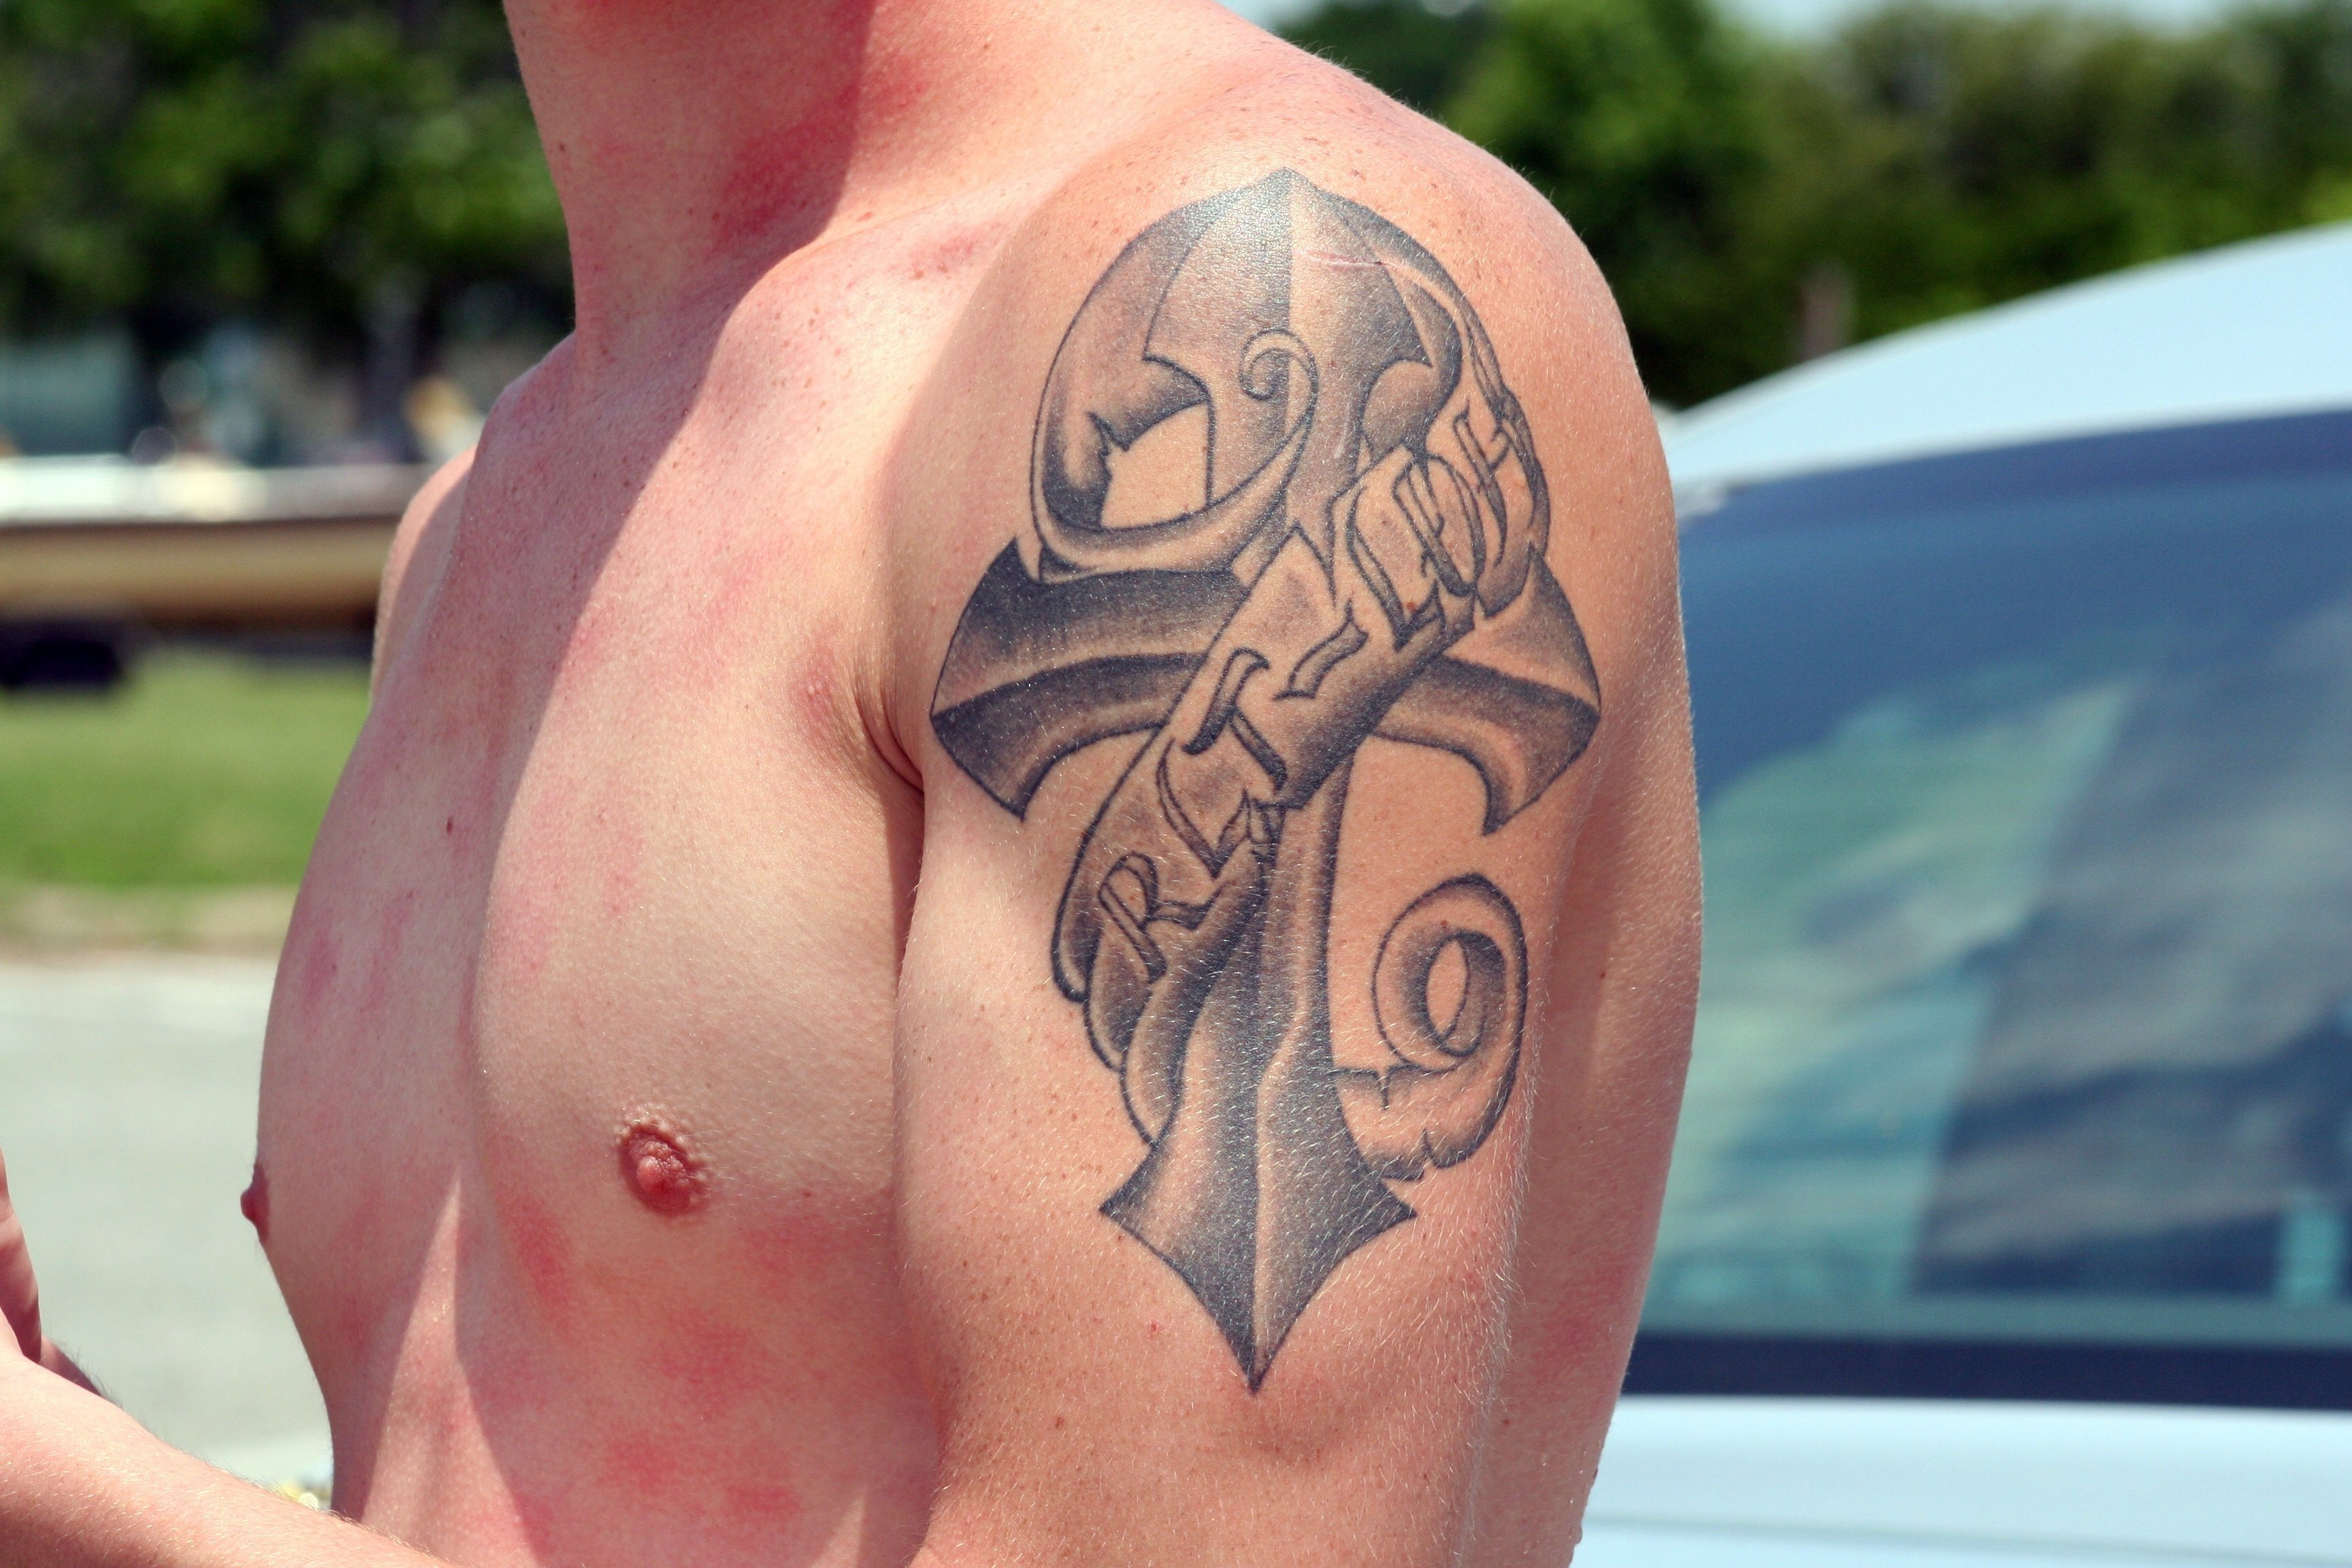 10 Trendy Ideas For A First Tattoo filefirst tattoo 3593353968 wikimedia commons 2020